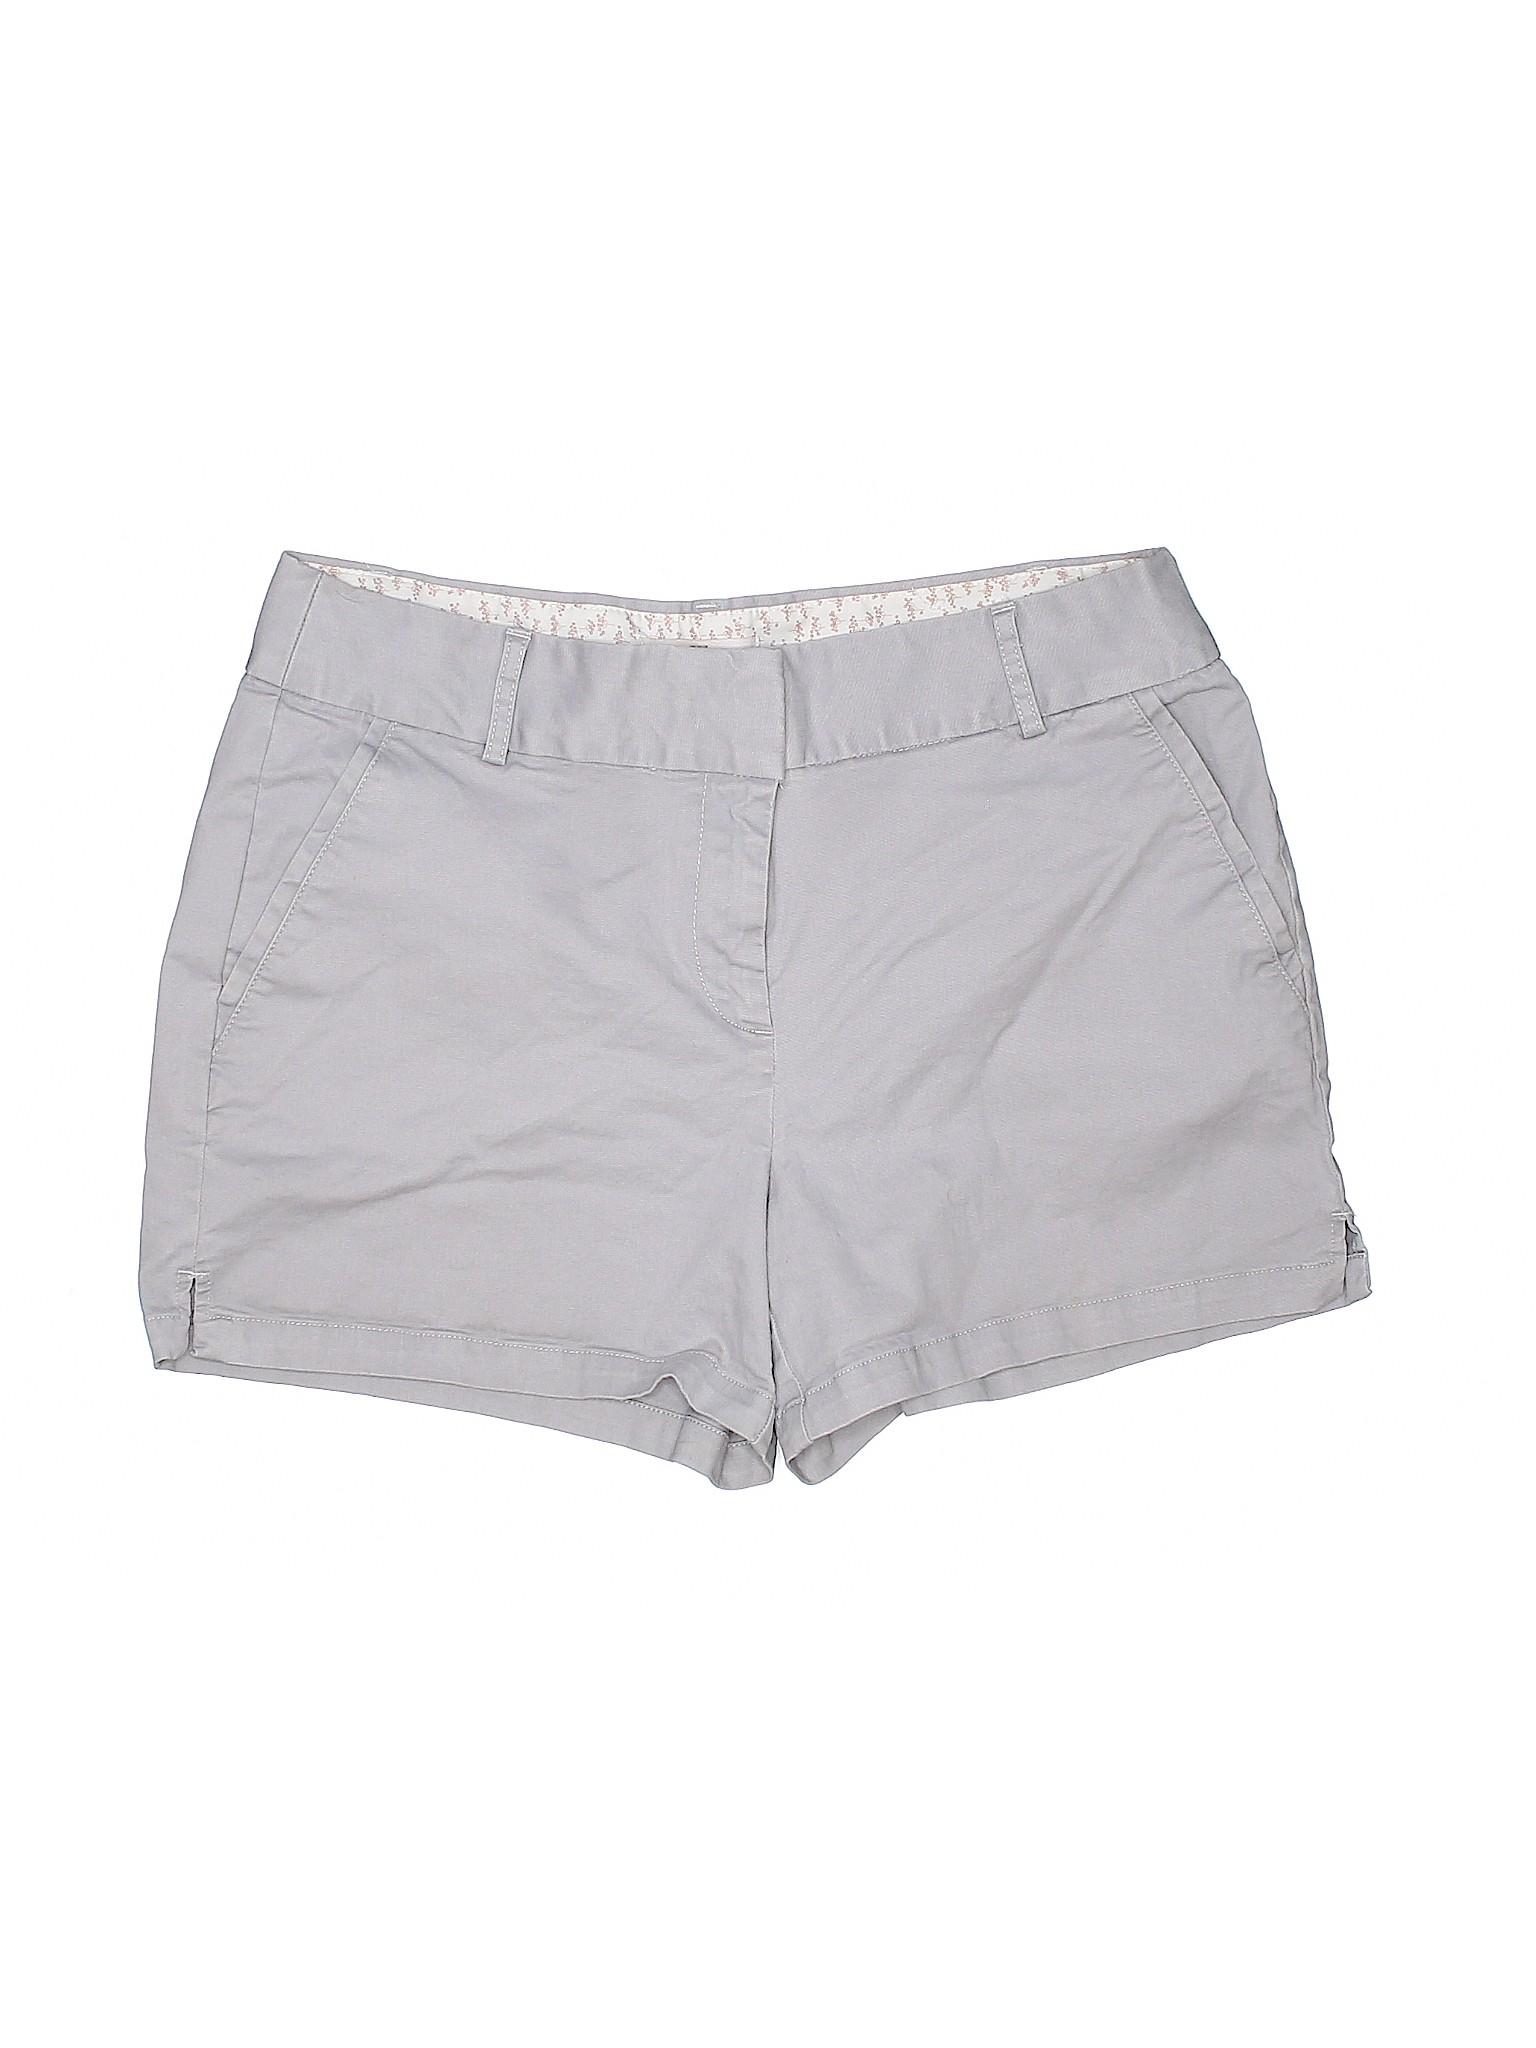 leisure Boutique Shorts Khaki Taylor Ann LOFT PBqdF1w